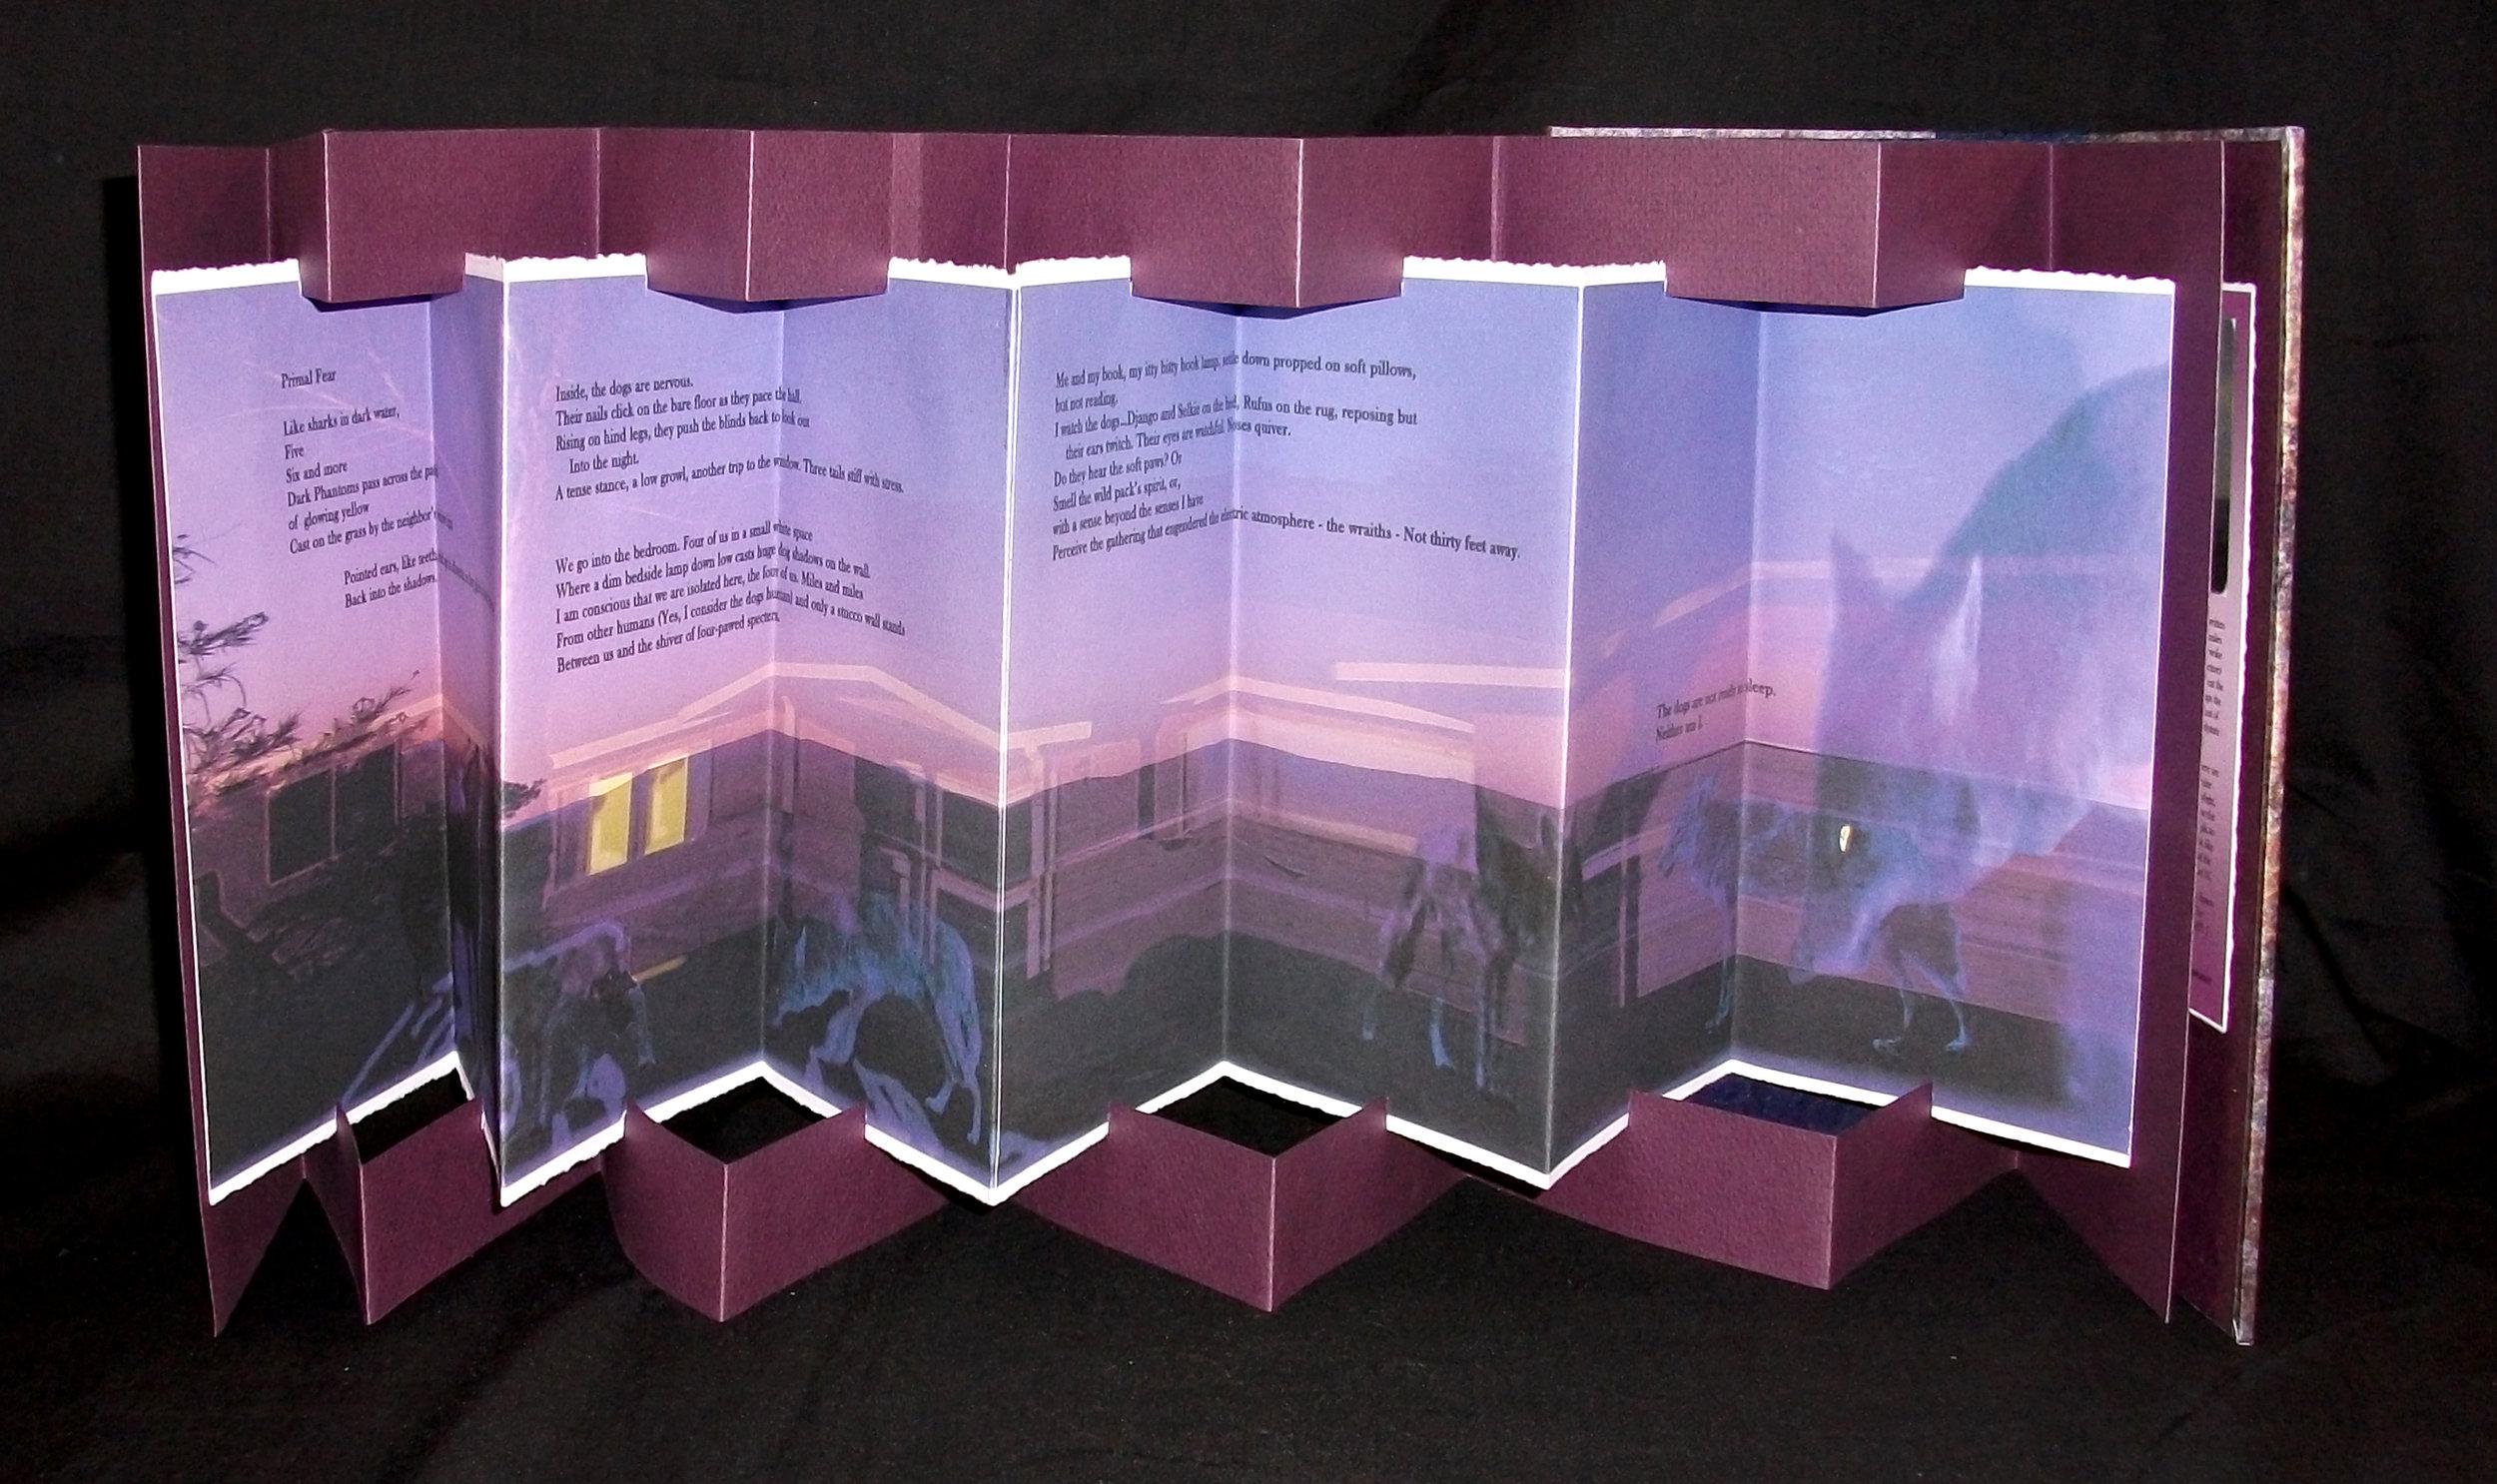 Primal Fear: A Poem, Margo Lemieux, Rives BFK, Strathmore, handmade paste paper, photography, Massachusetts, 2007